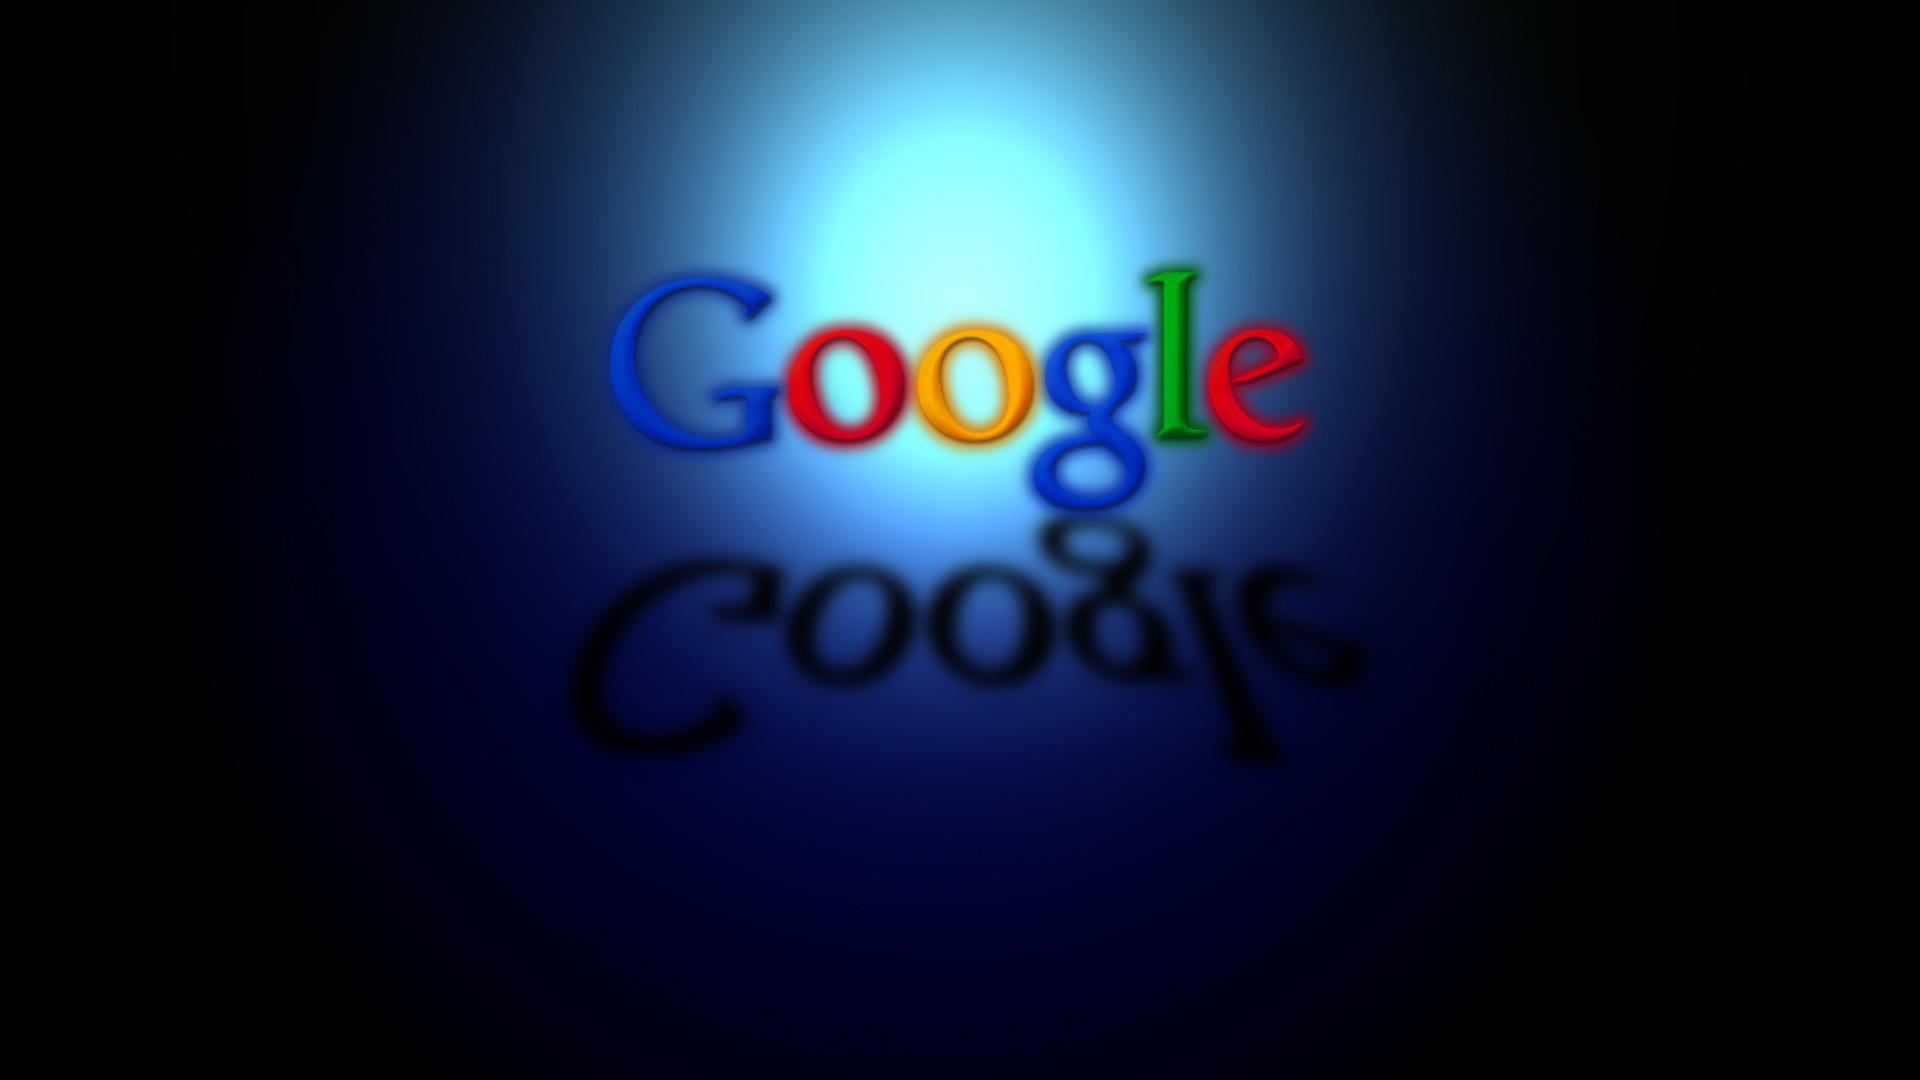 1920x1080 Google Desktop Theme Background Wallpaper Backgrounds